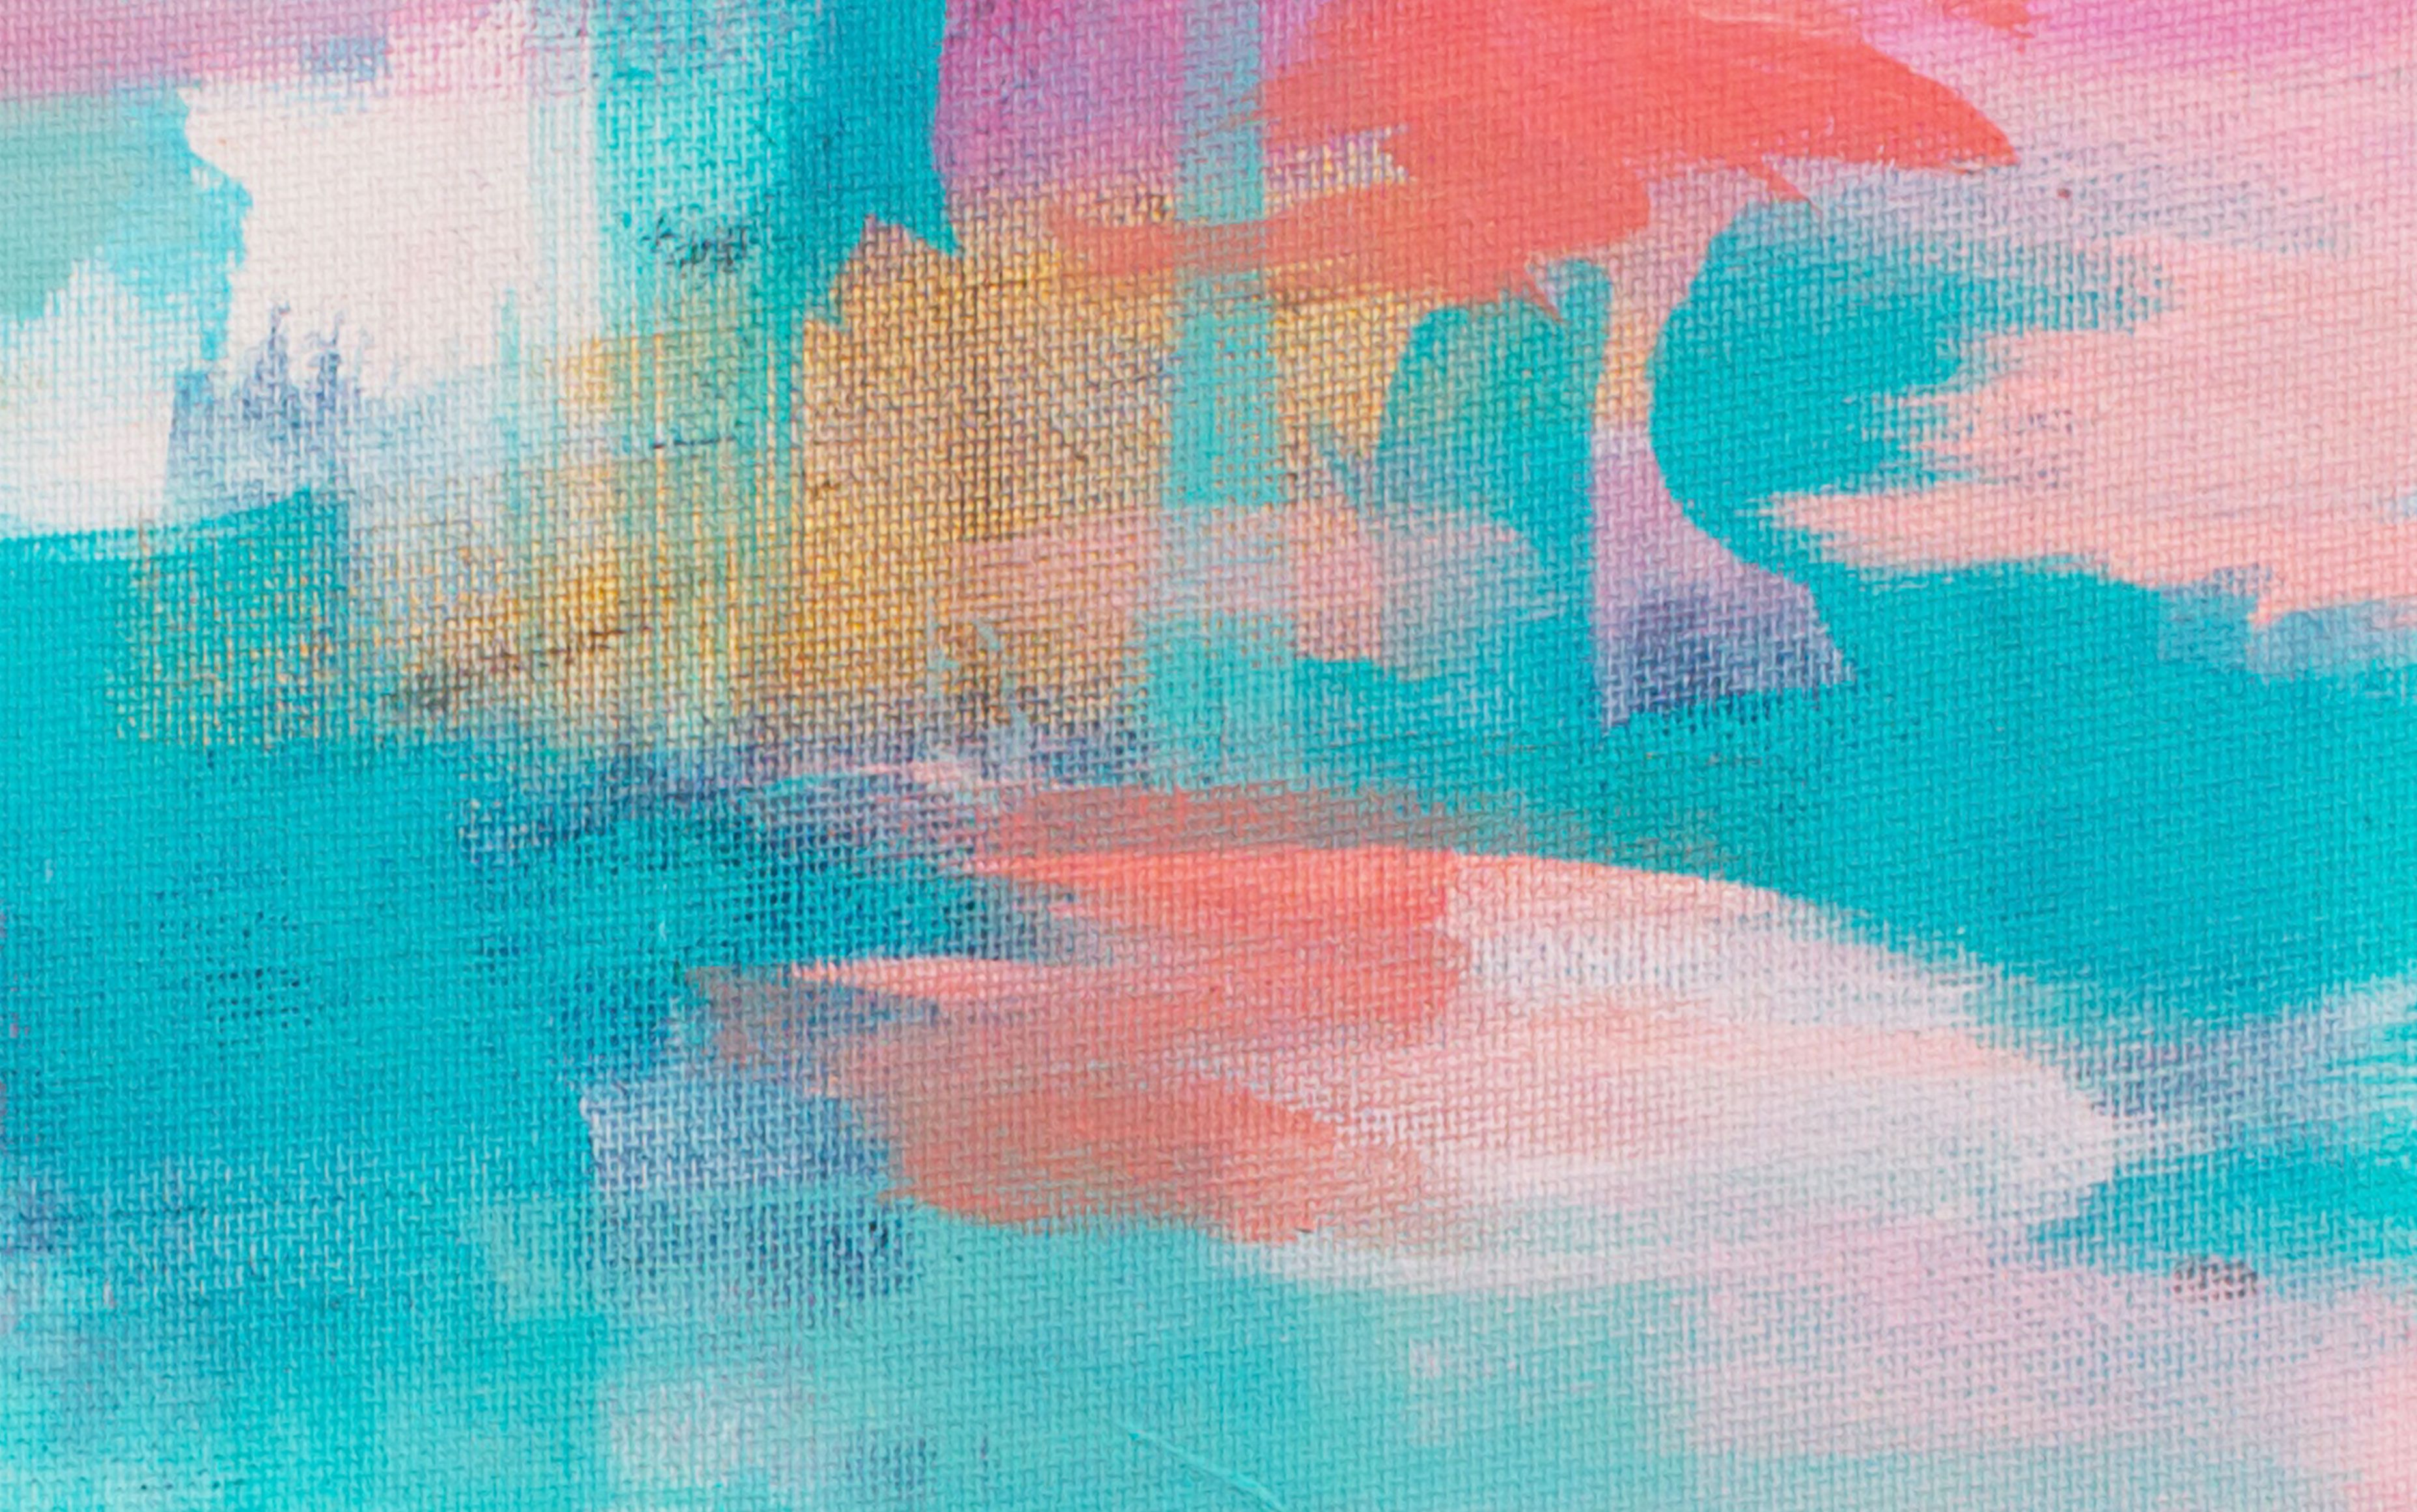 Painted Artwork Desktop WallpaperScreensaver 3712x2322